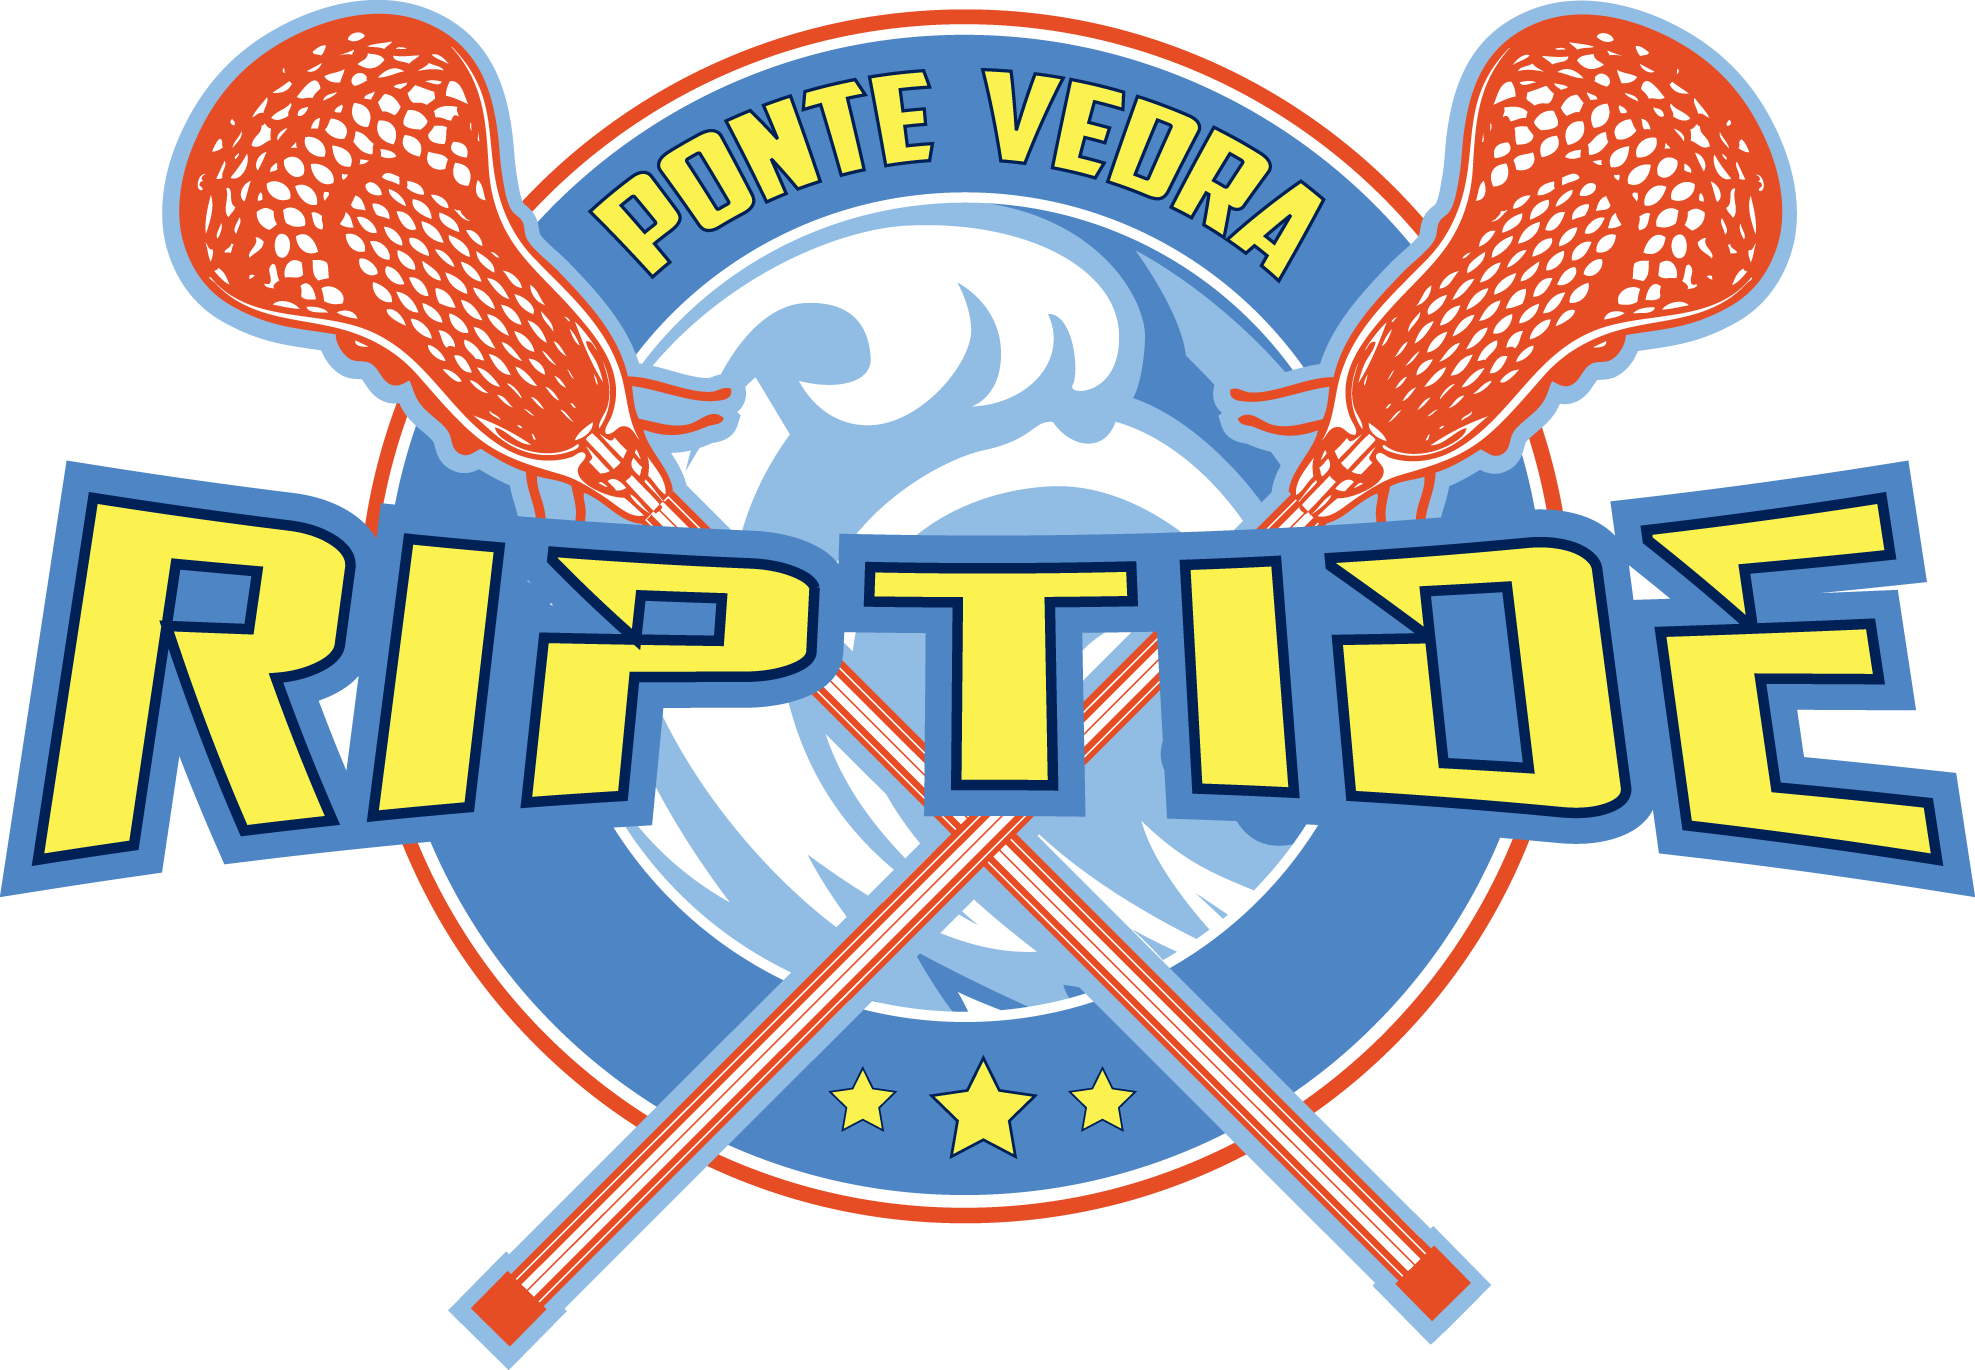 Facebook pv riptide follow. Lacrosse clipart girl logo